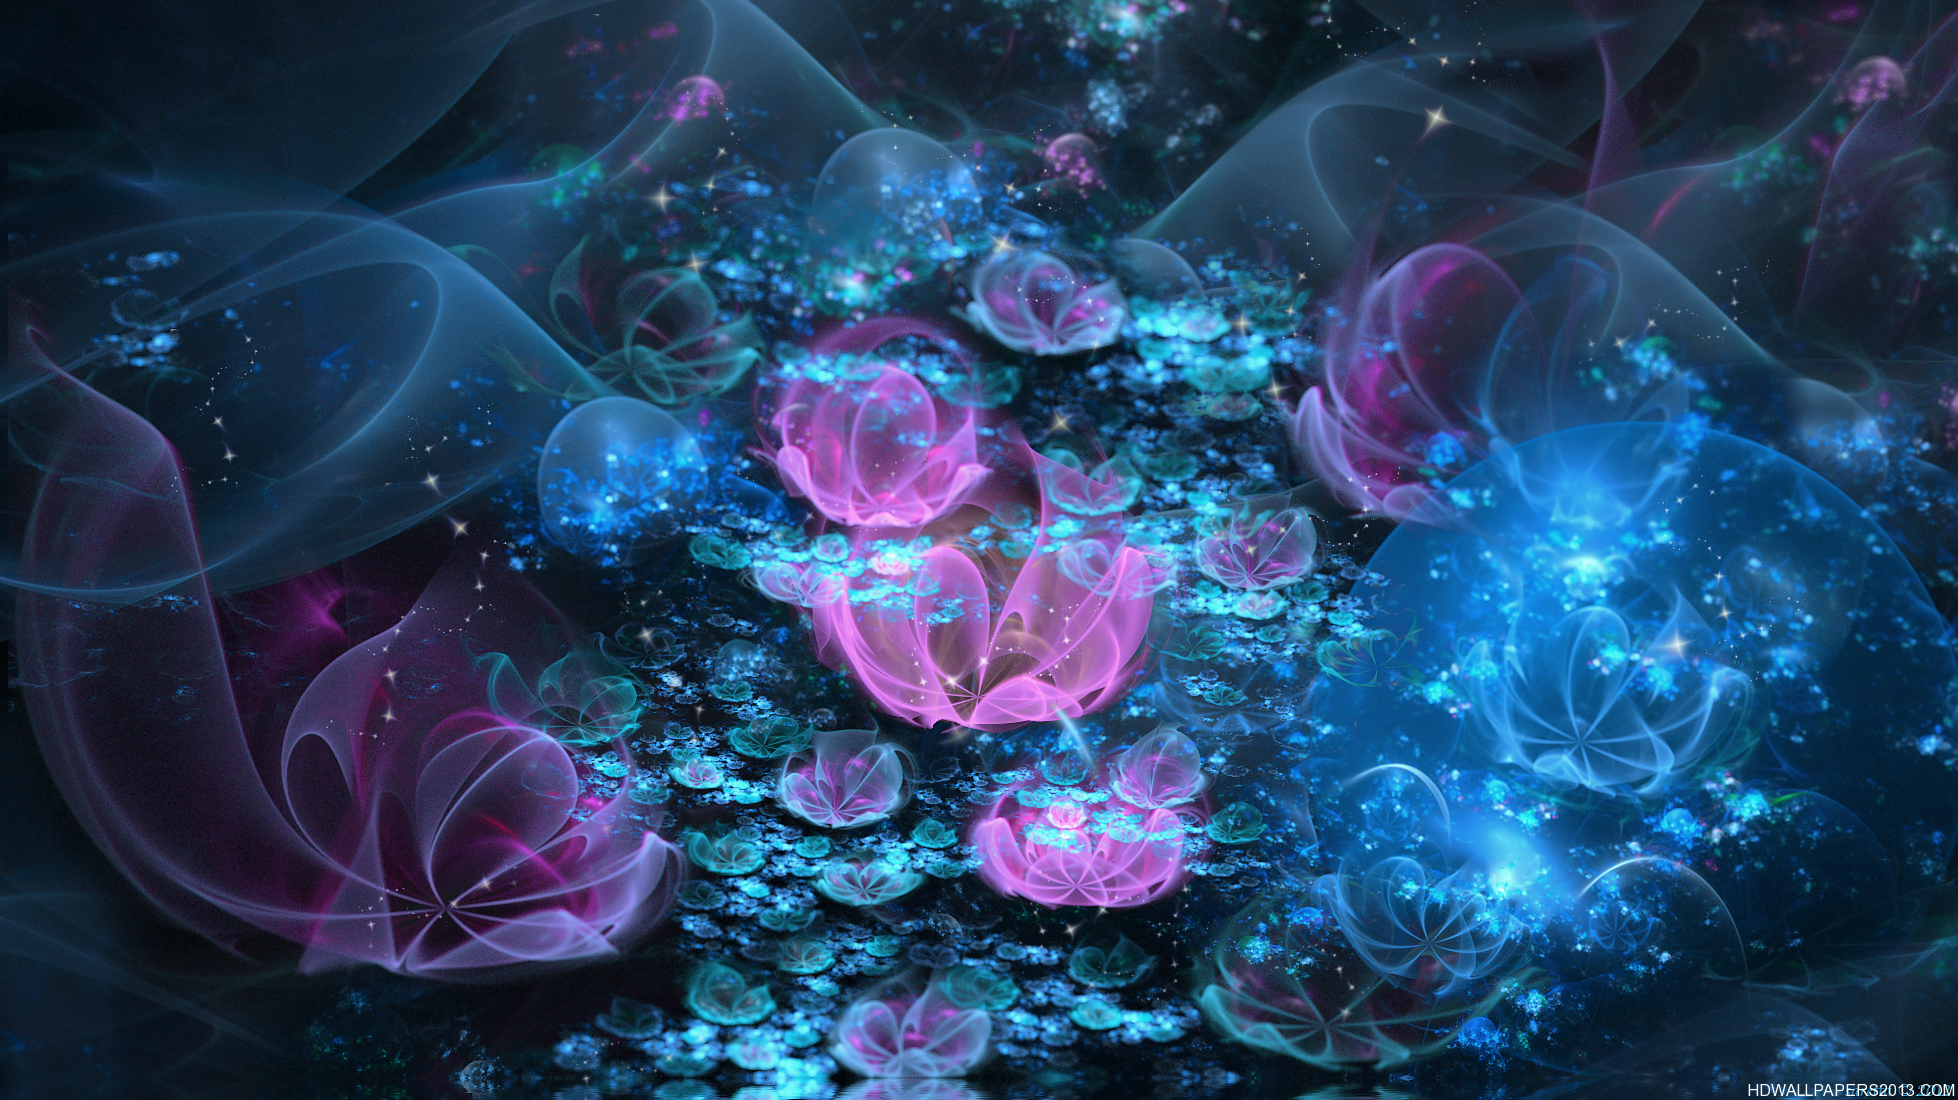 Mystical wallpapers for desktop wallpapersafari - Mystical background pictures ...